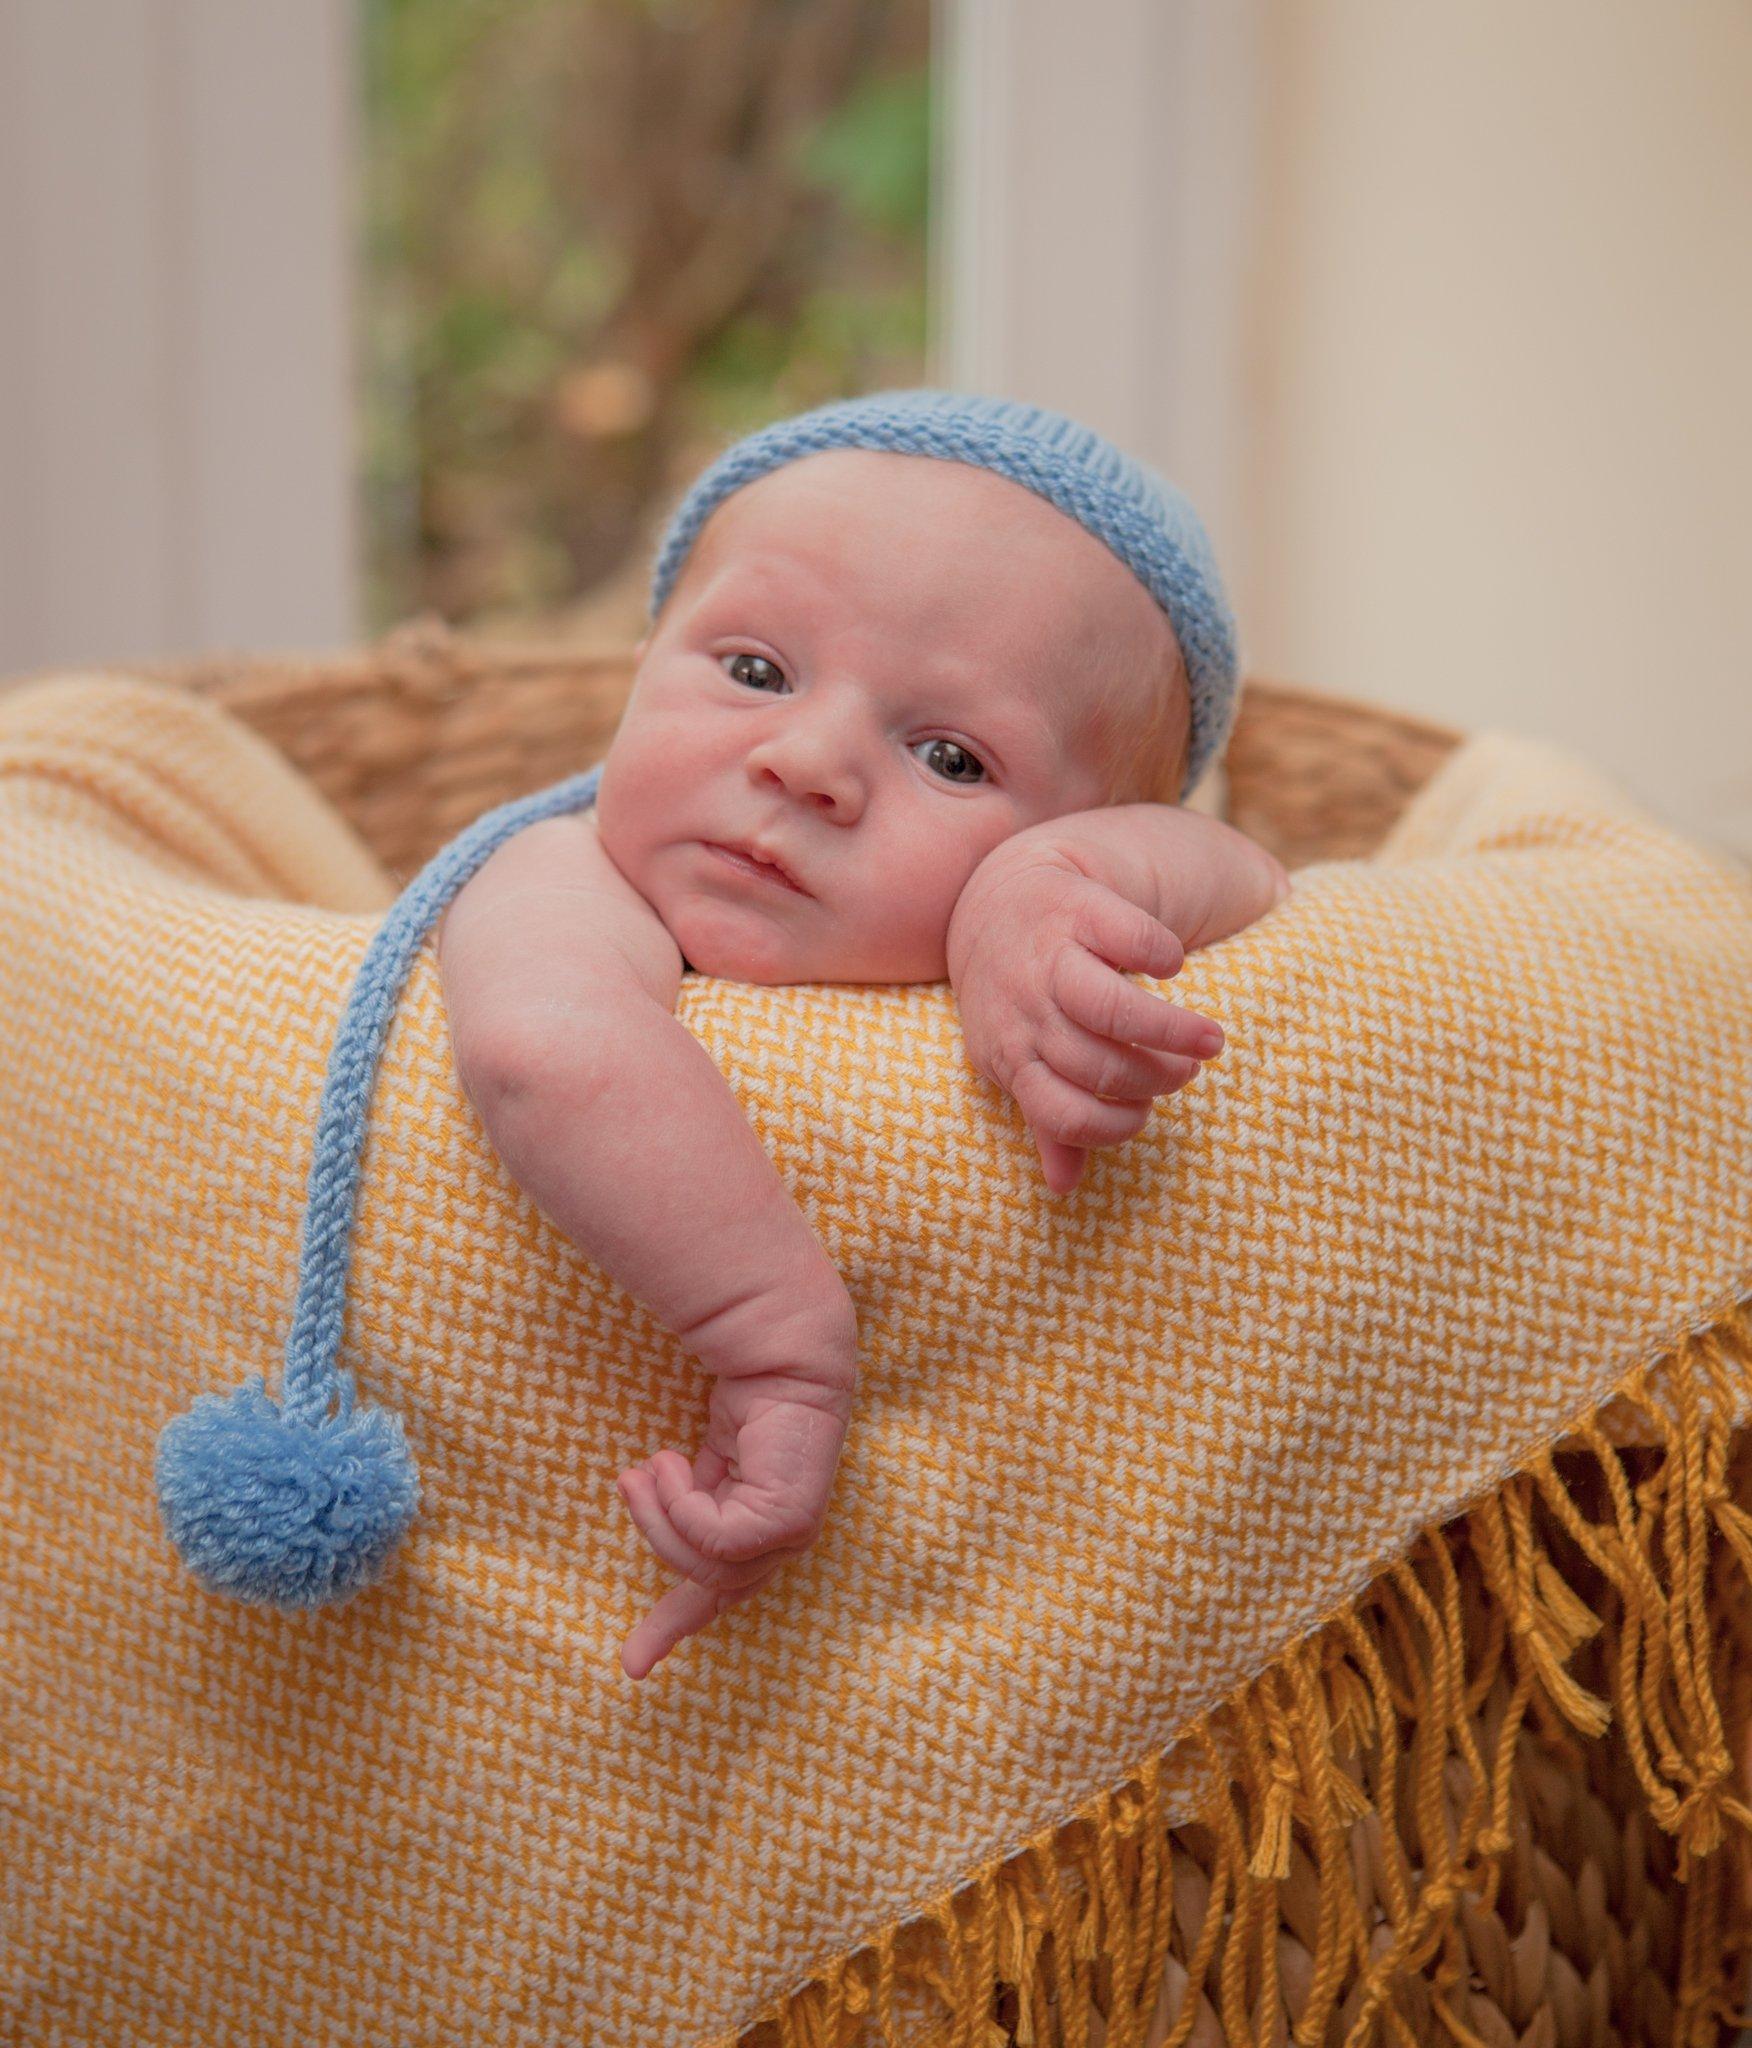 newborn photographer Abergavenny, Tania Miller Photography, baby boy, Abergavenny newborn photographer,newborn photographer Cwmbran, newborn photographer Pontypool